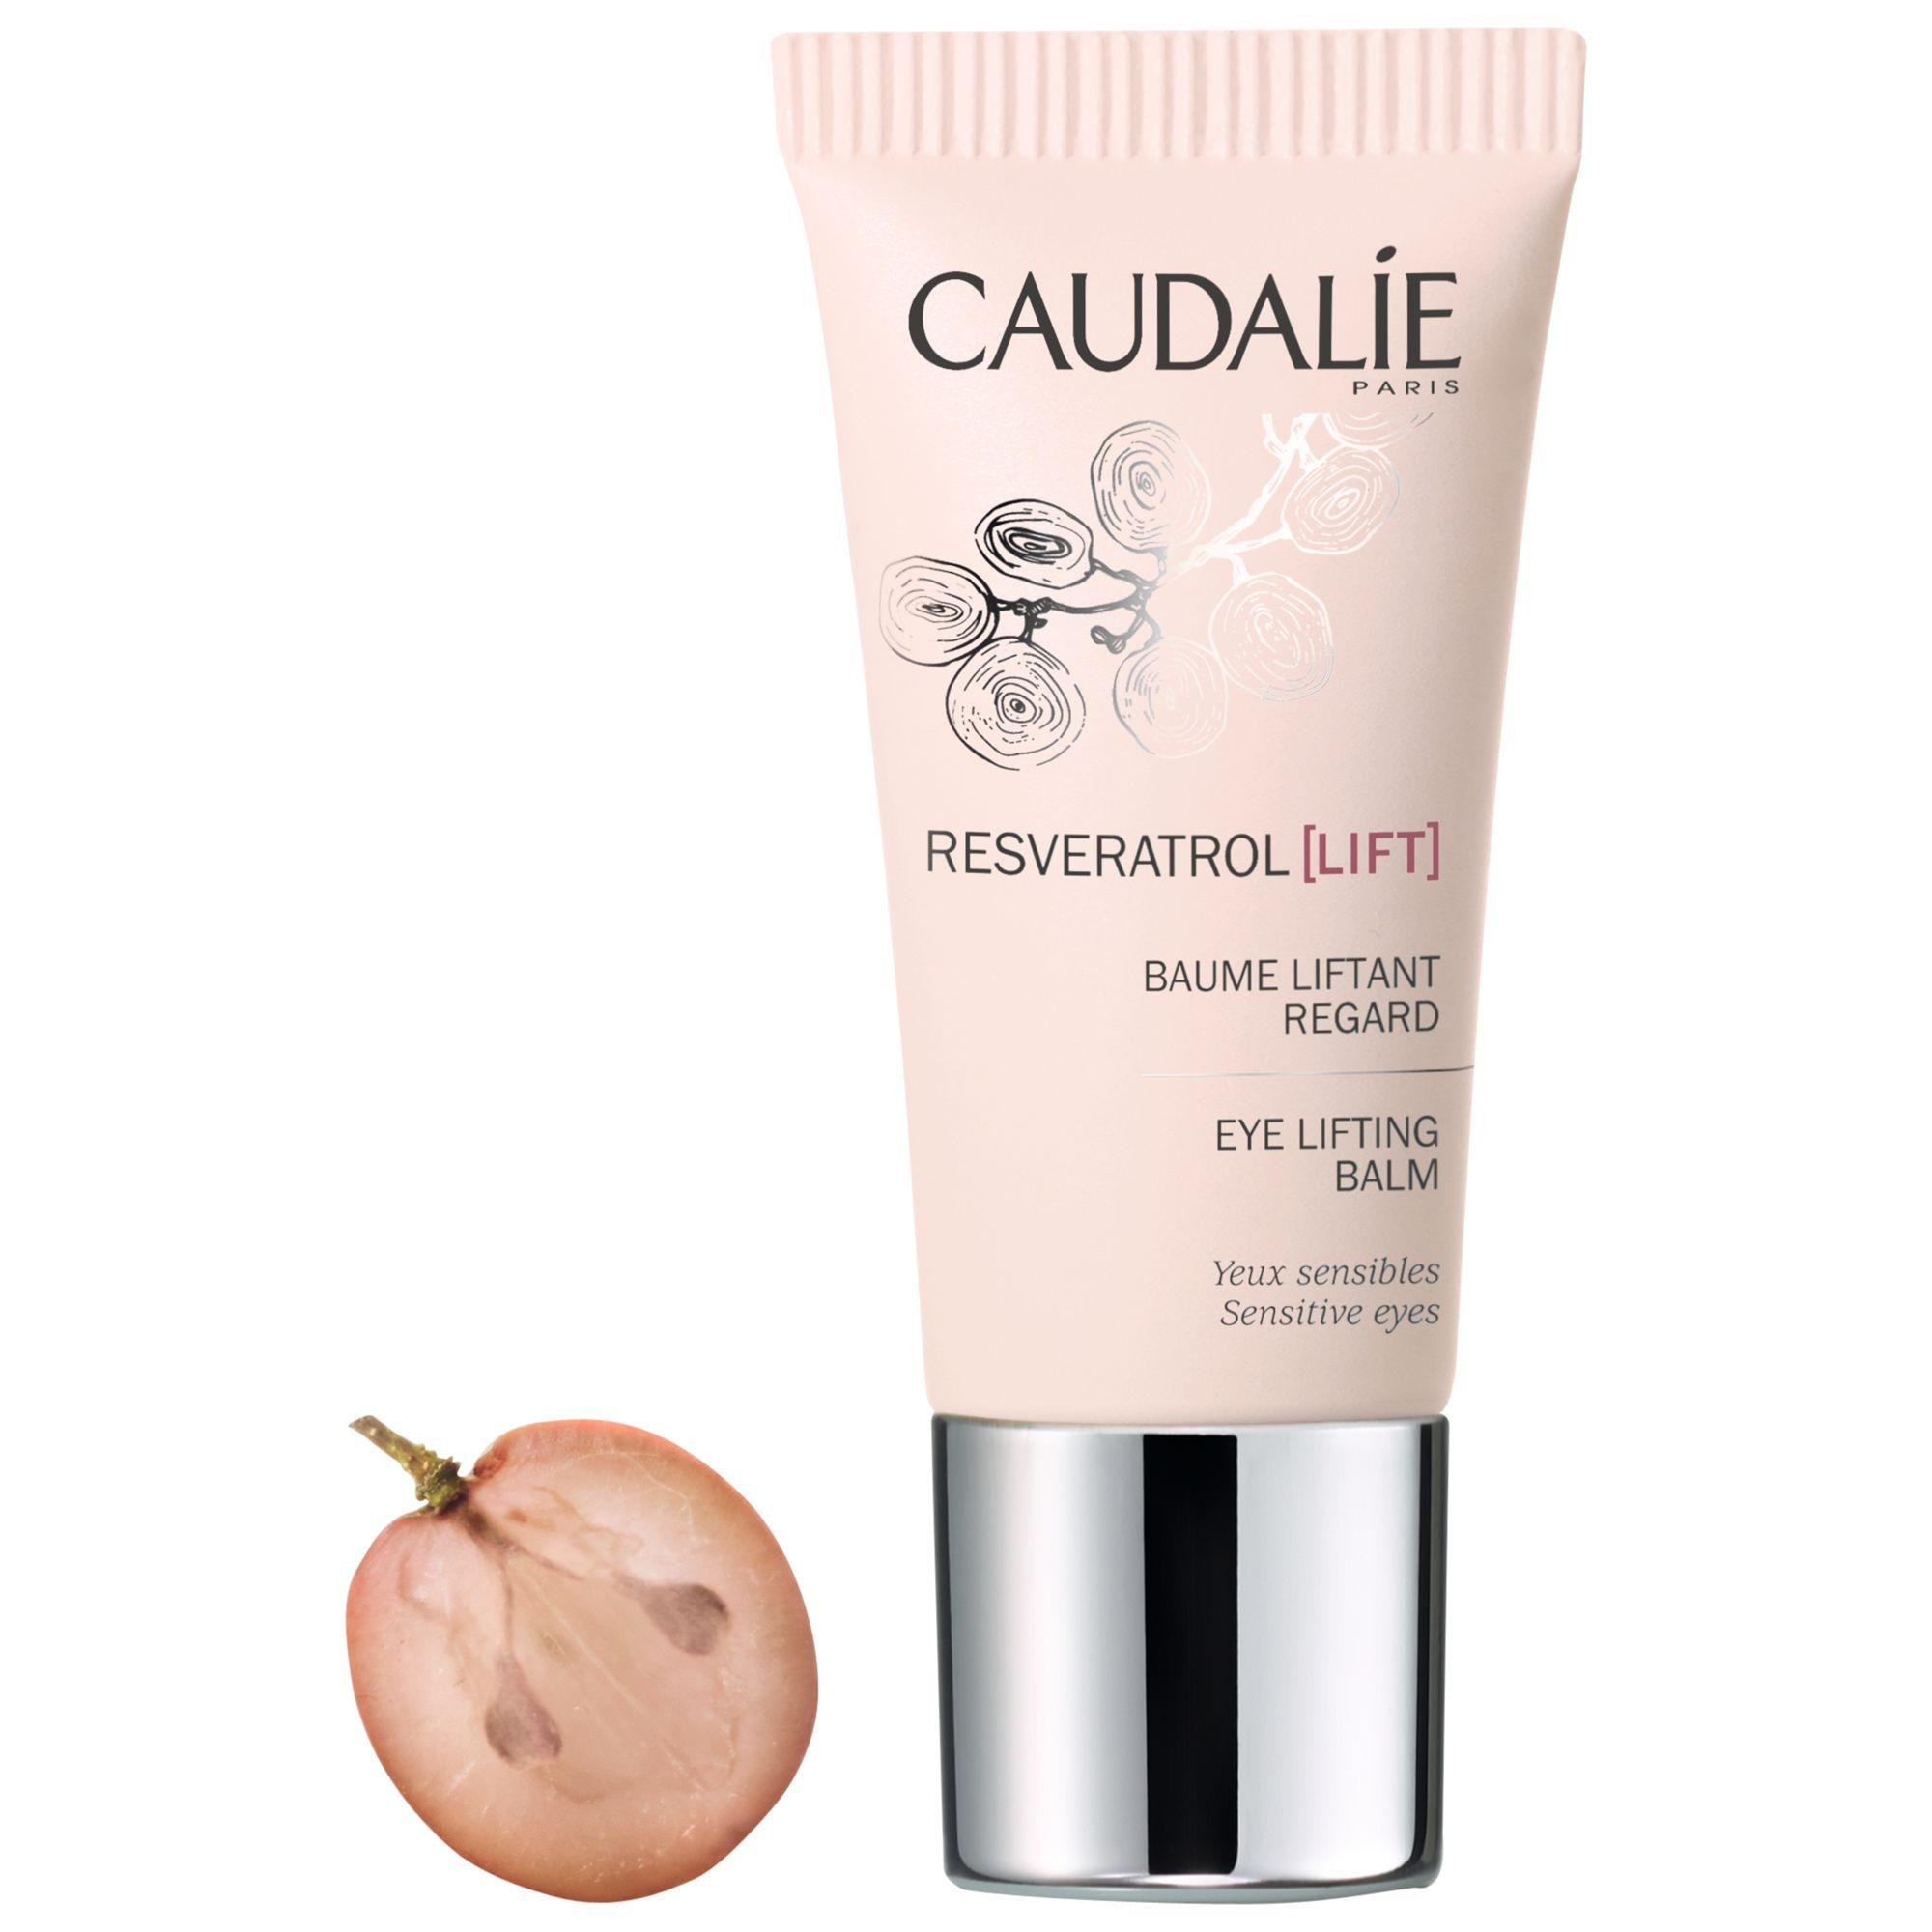 Caudalie Caudalie Resveratrol Eye Lifting Balm, 15ml